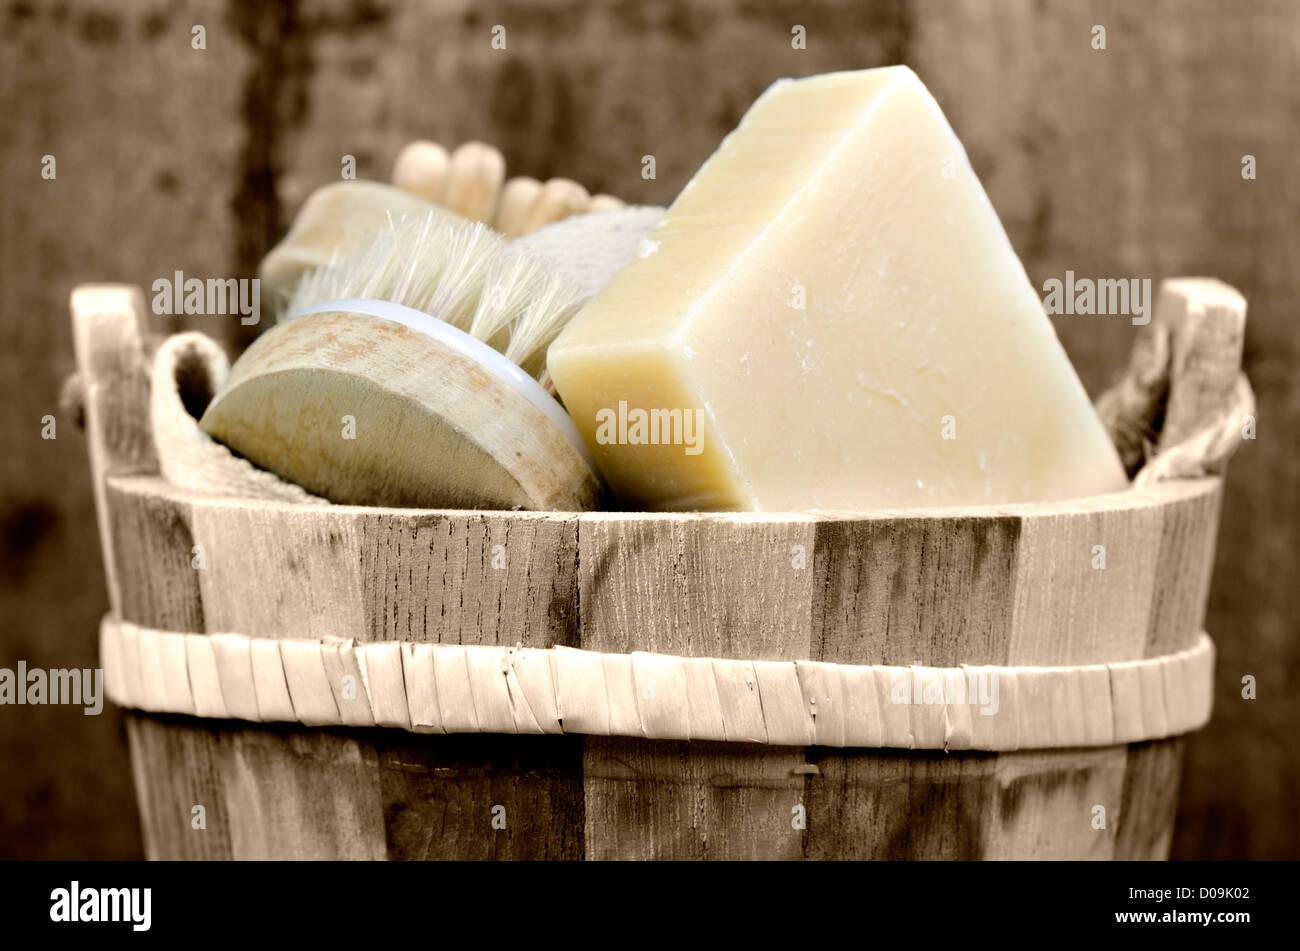 a washtub with washing accessory - Stock Image